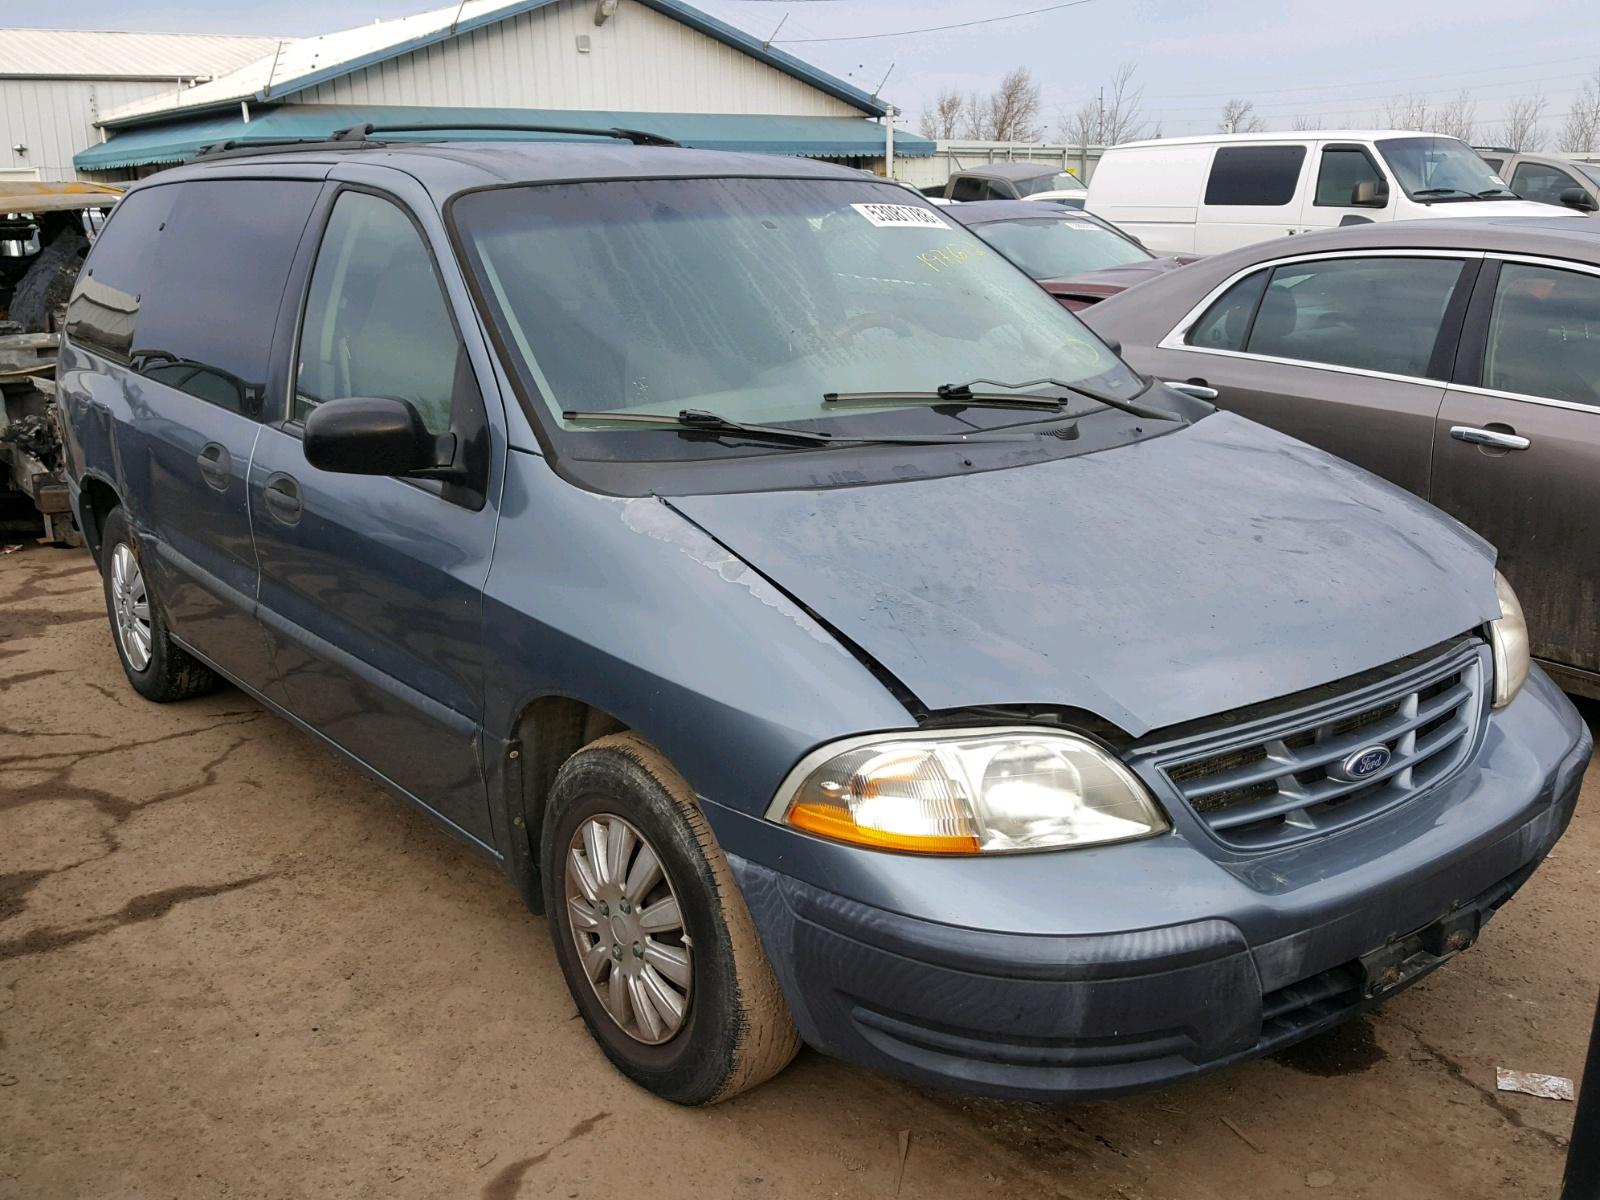 2fmza5144yba27369 2000 ford windstar l 3 8l left view 2fmza5144yba27369